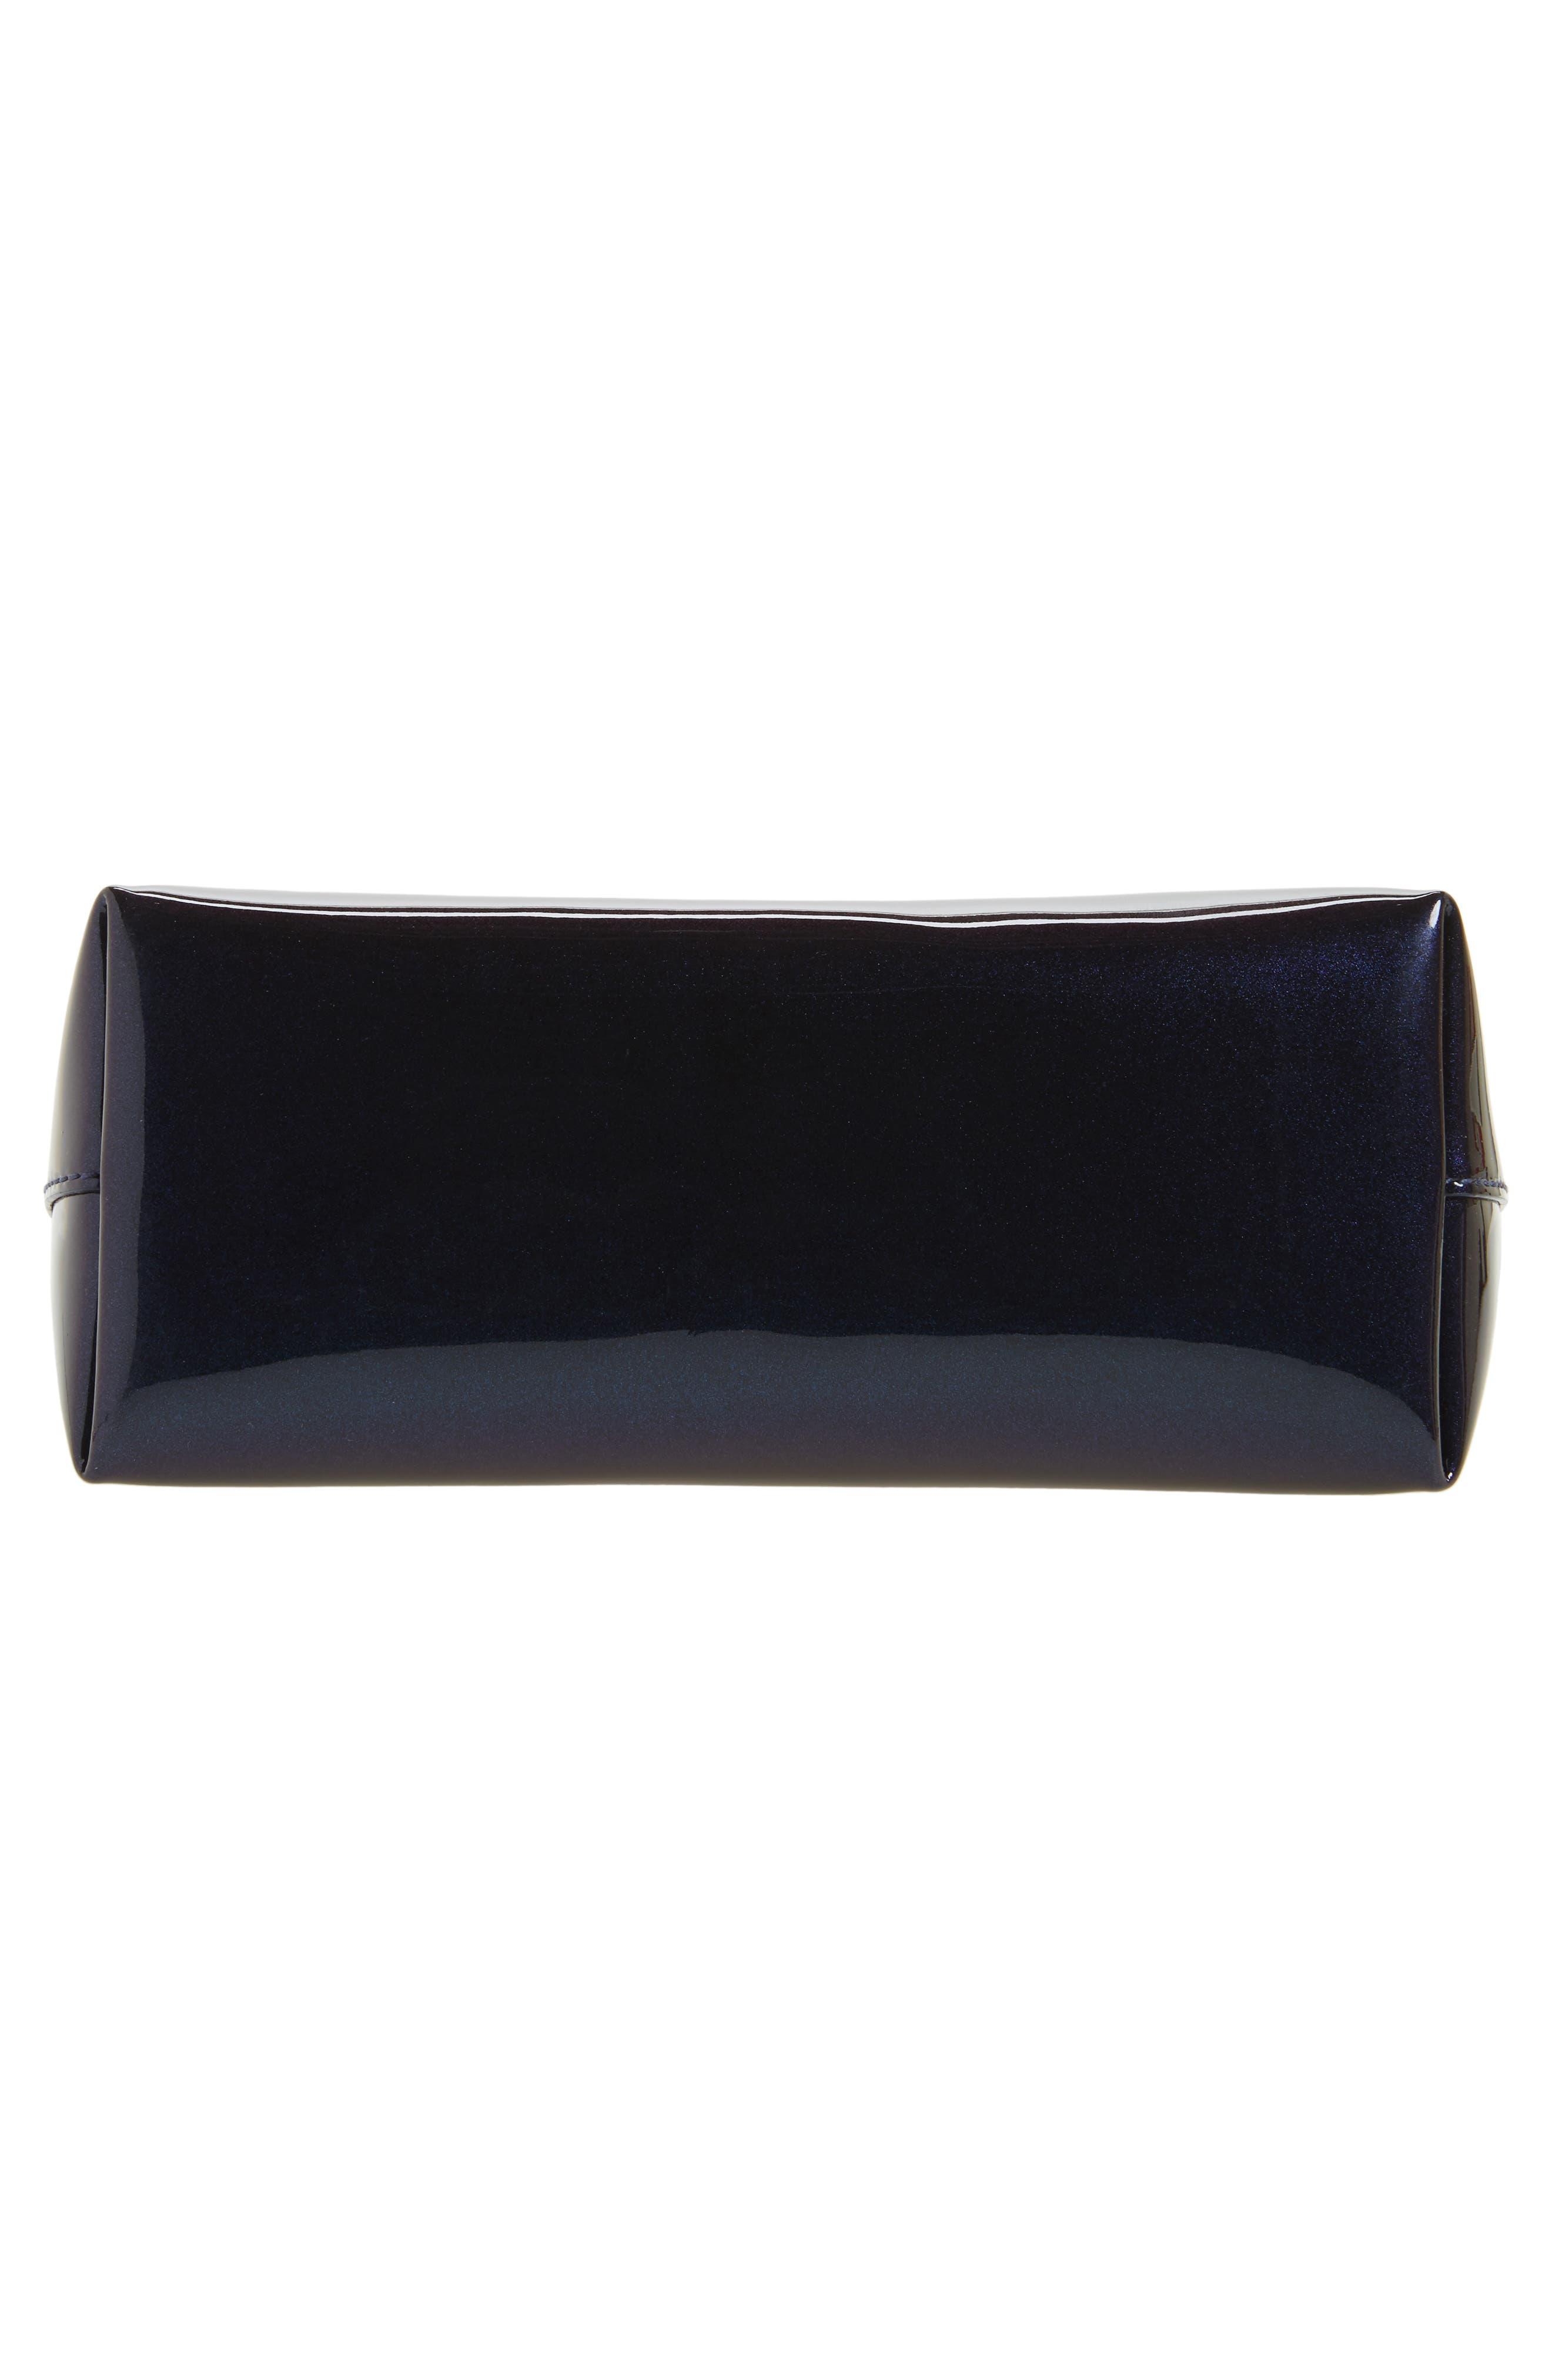 Iridescent Ring Crossbody Bag,                             Alternate thumbnail 7, color,                             Galaxy Navy